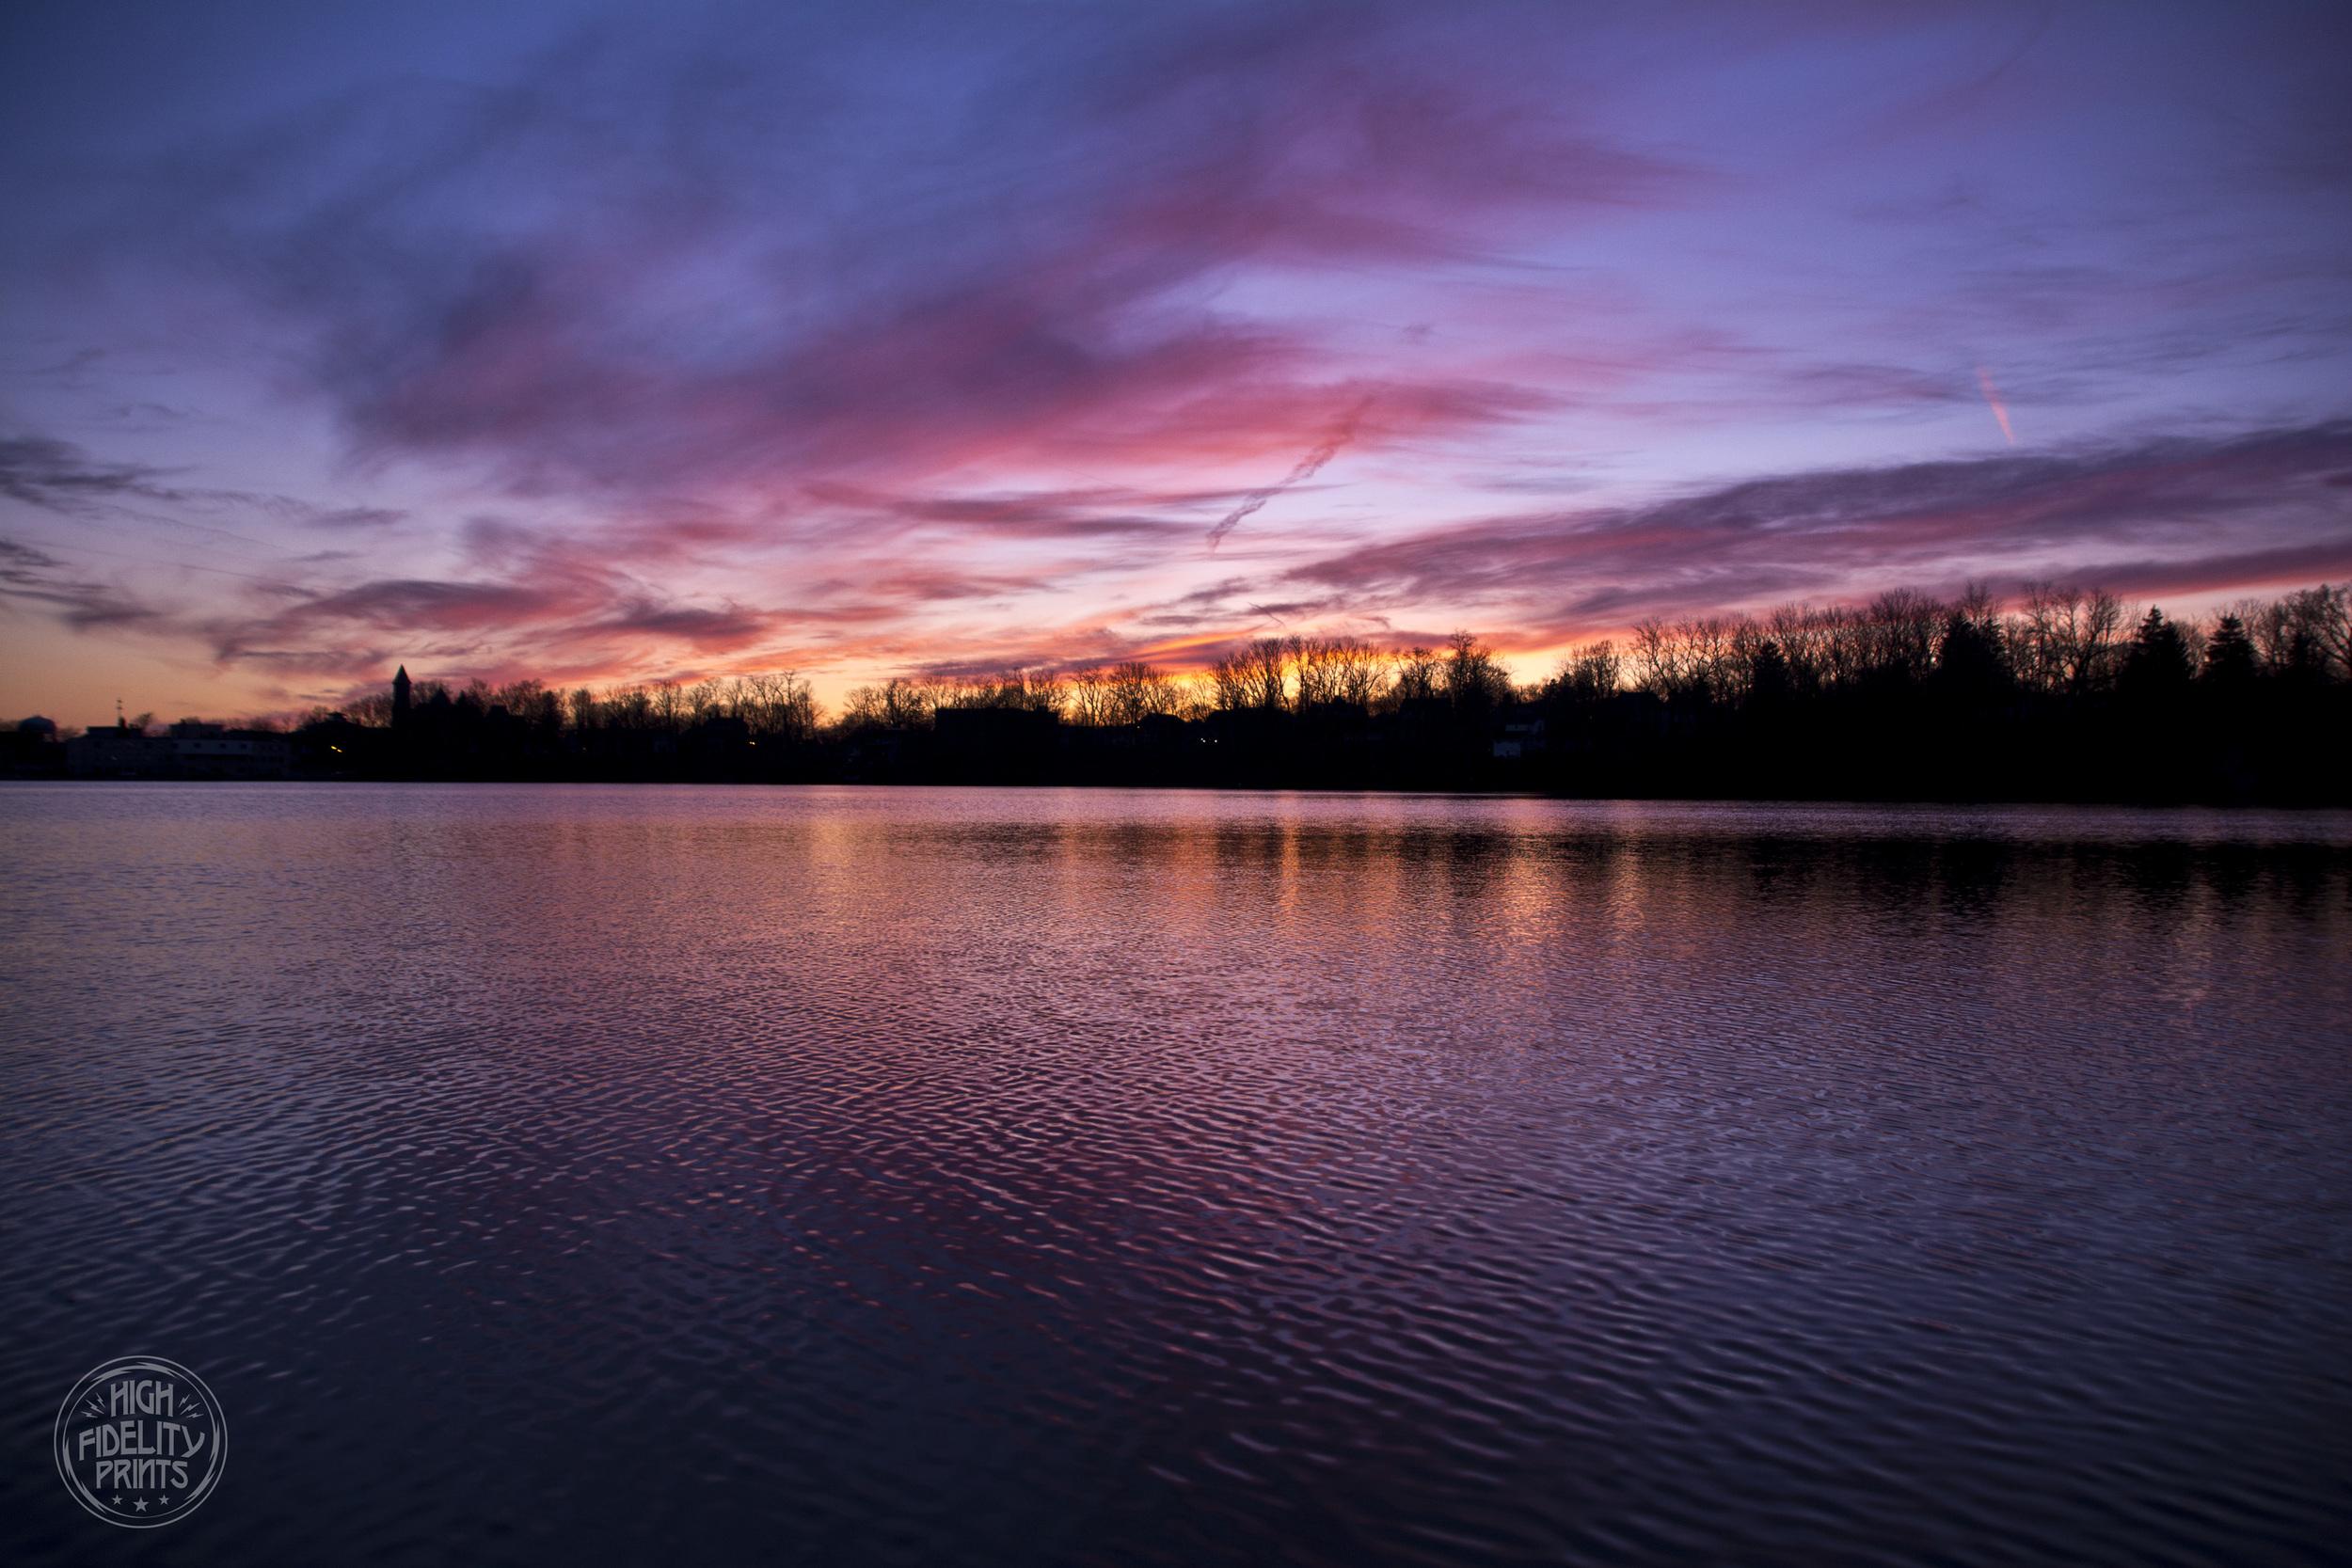 Sunset over Van Cleef Lake